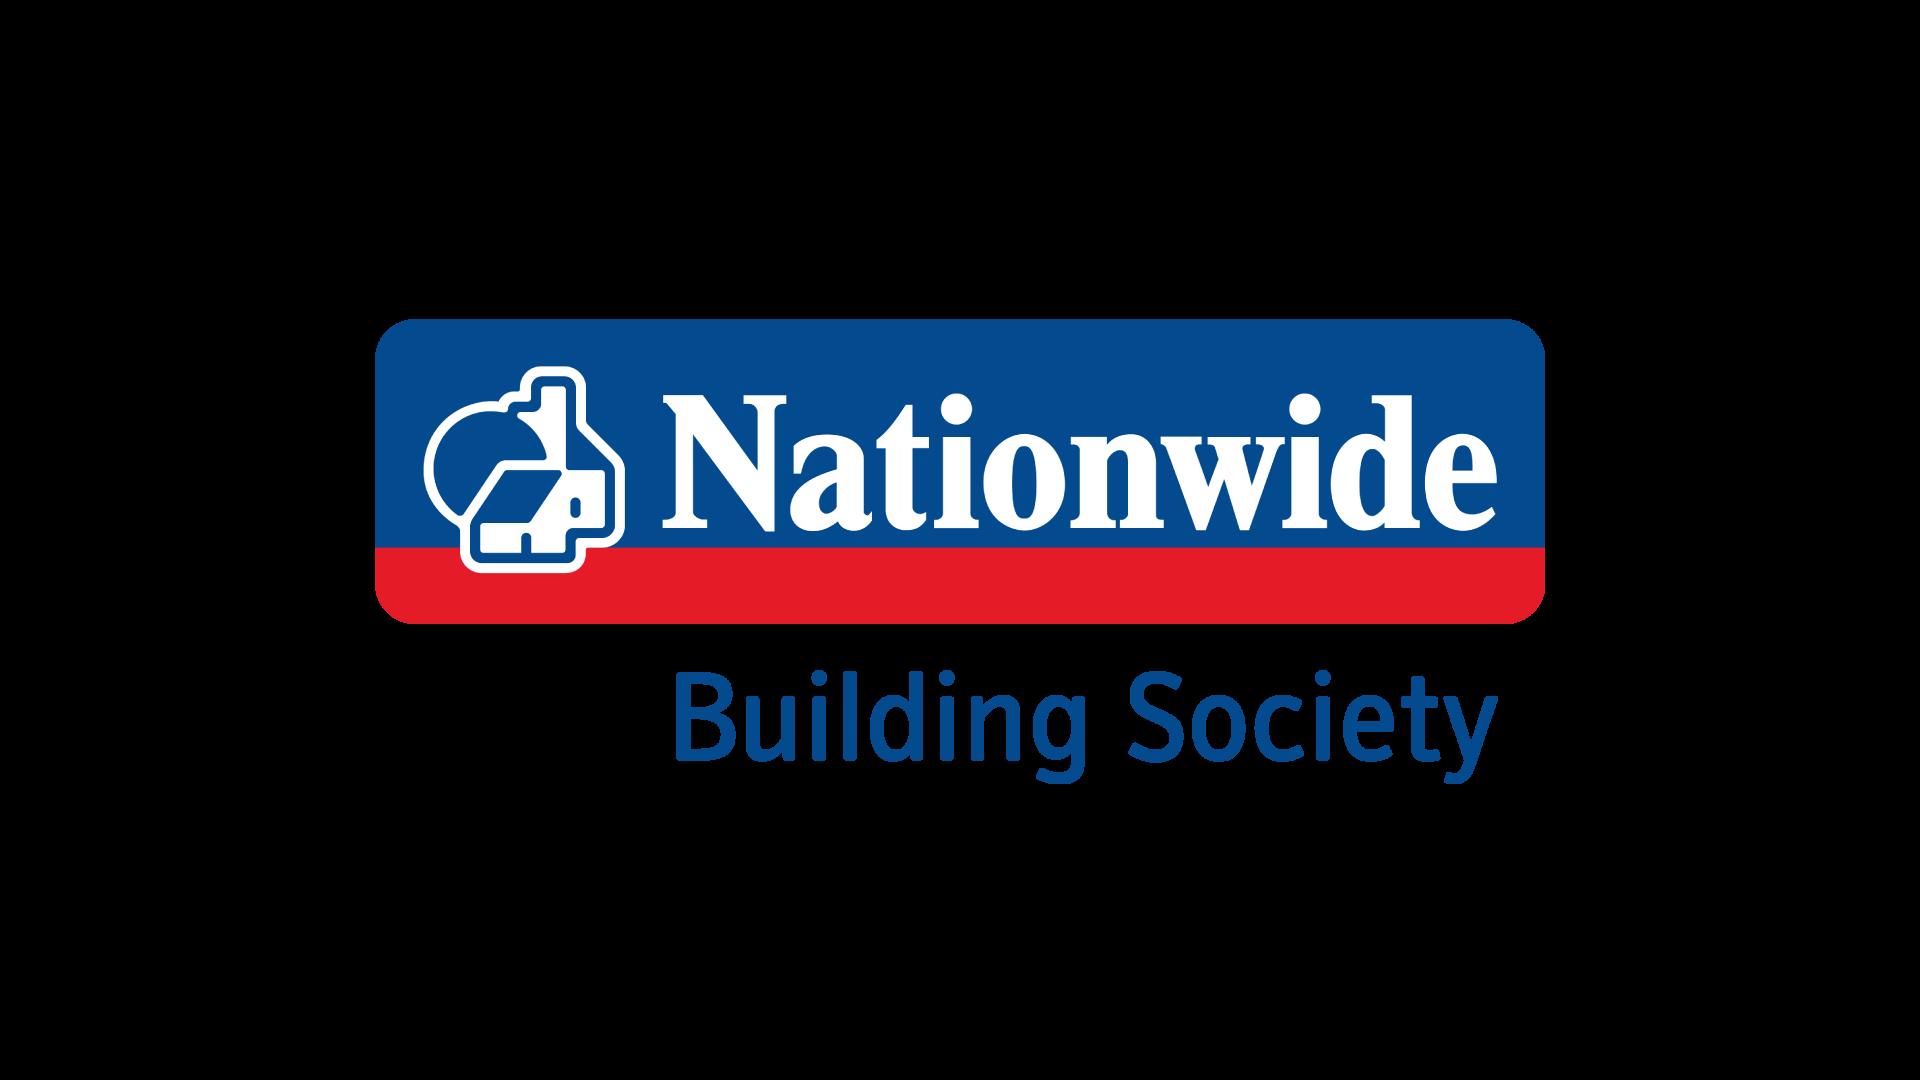 CADS client Nationwide